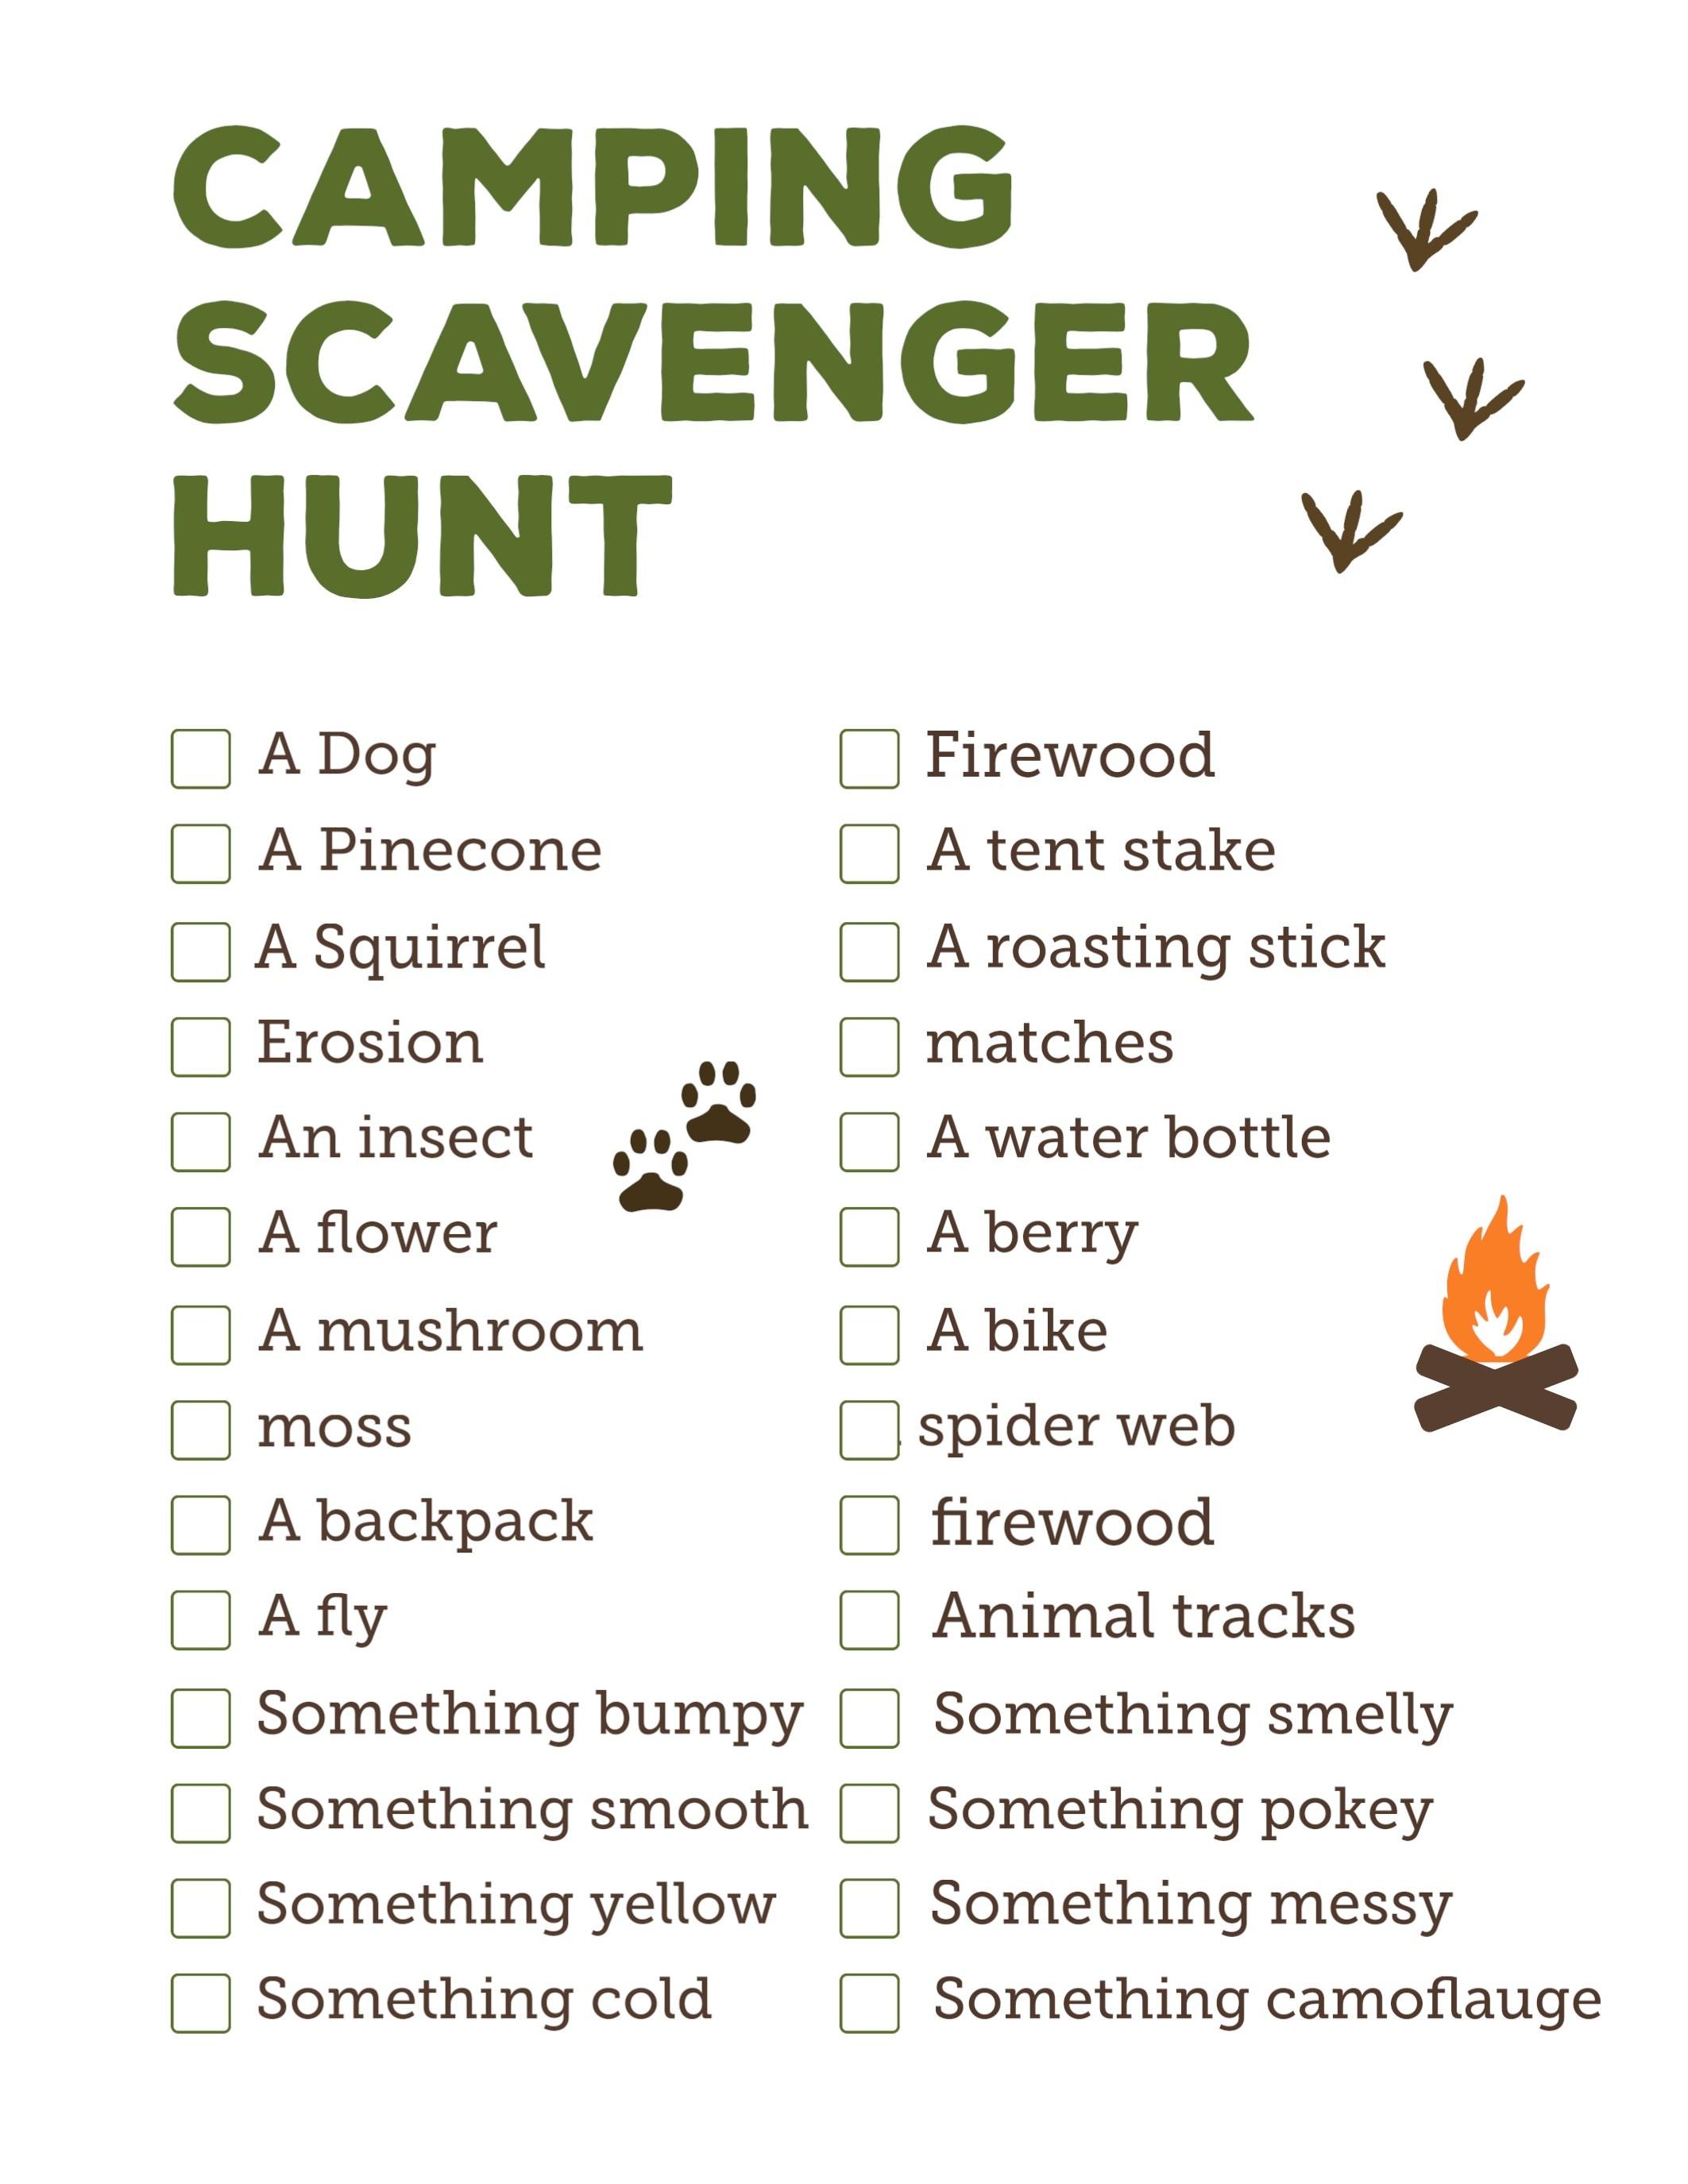 Camping Scavenger Hunt Printable - Paper Trail Design - Free Printable Scavenger Hunt For Kids